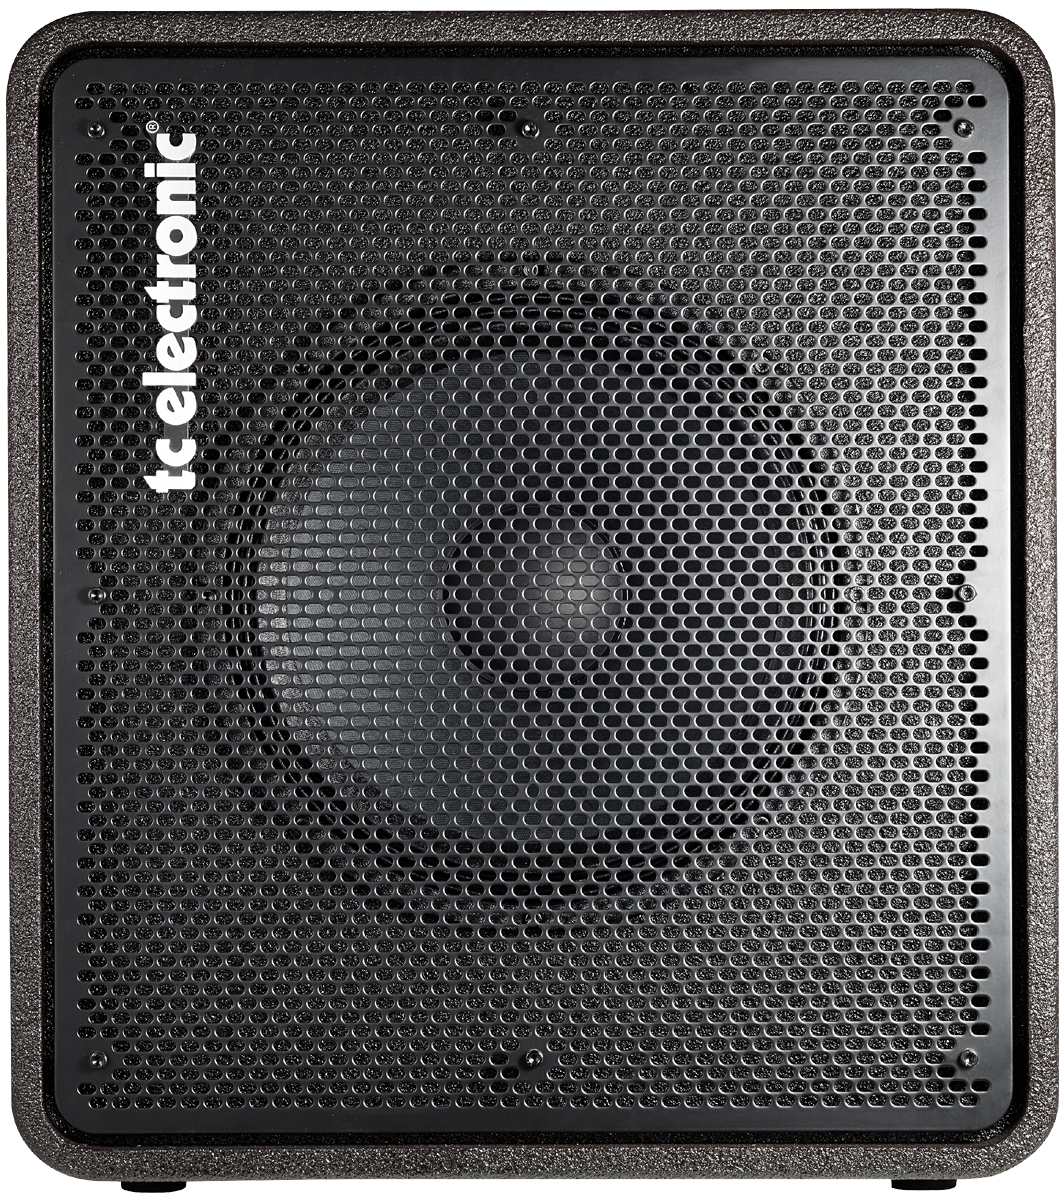 ii neo global item cabinet new amp amplifier planet krueger brand en guitarplanet gallienkruger cabinets rakuten store guitar bass market gallien